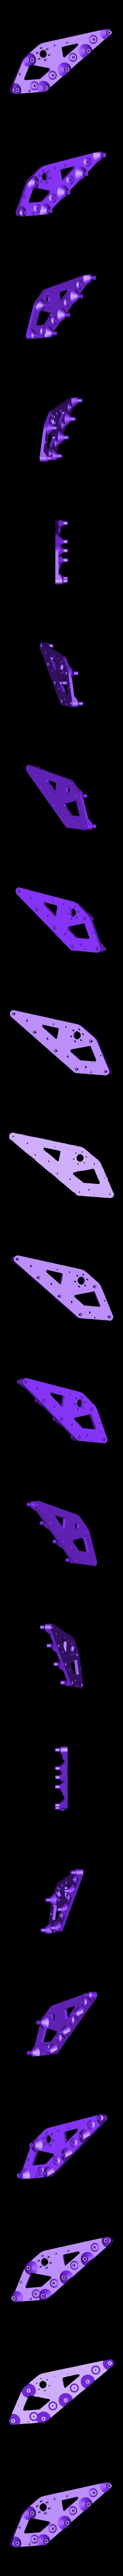 Seitenteil.stl Download STL file RC Speed Tank • 3D printable design, Bryant